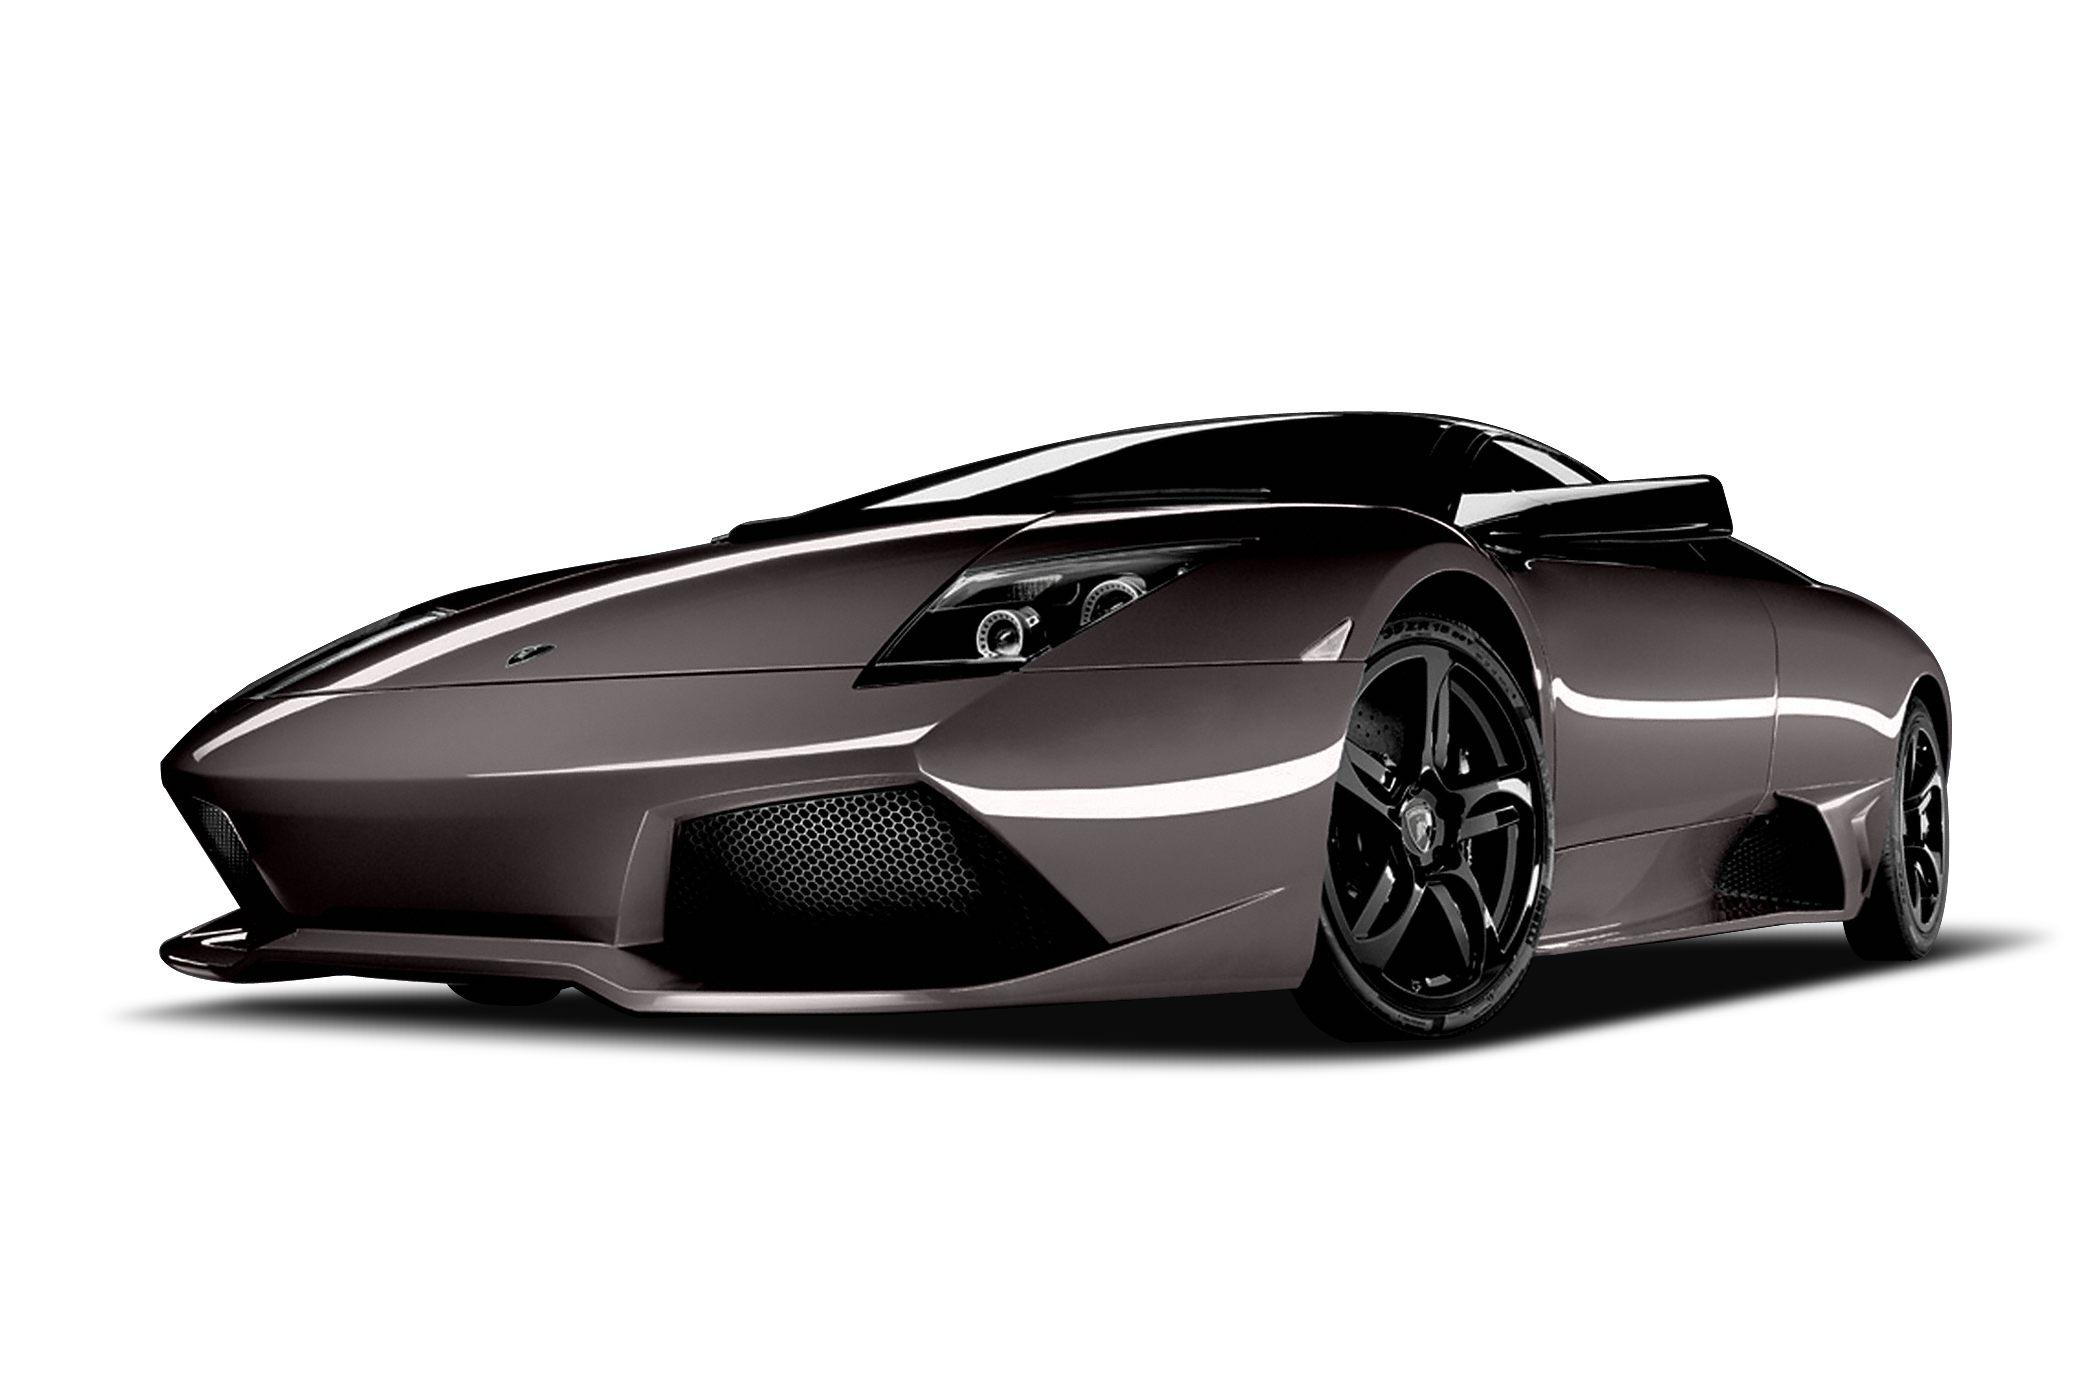 2009 Lamborghini Murcielago